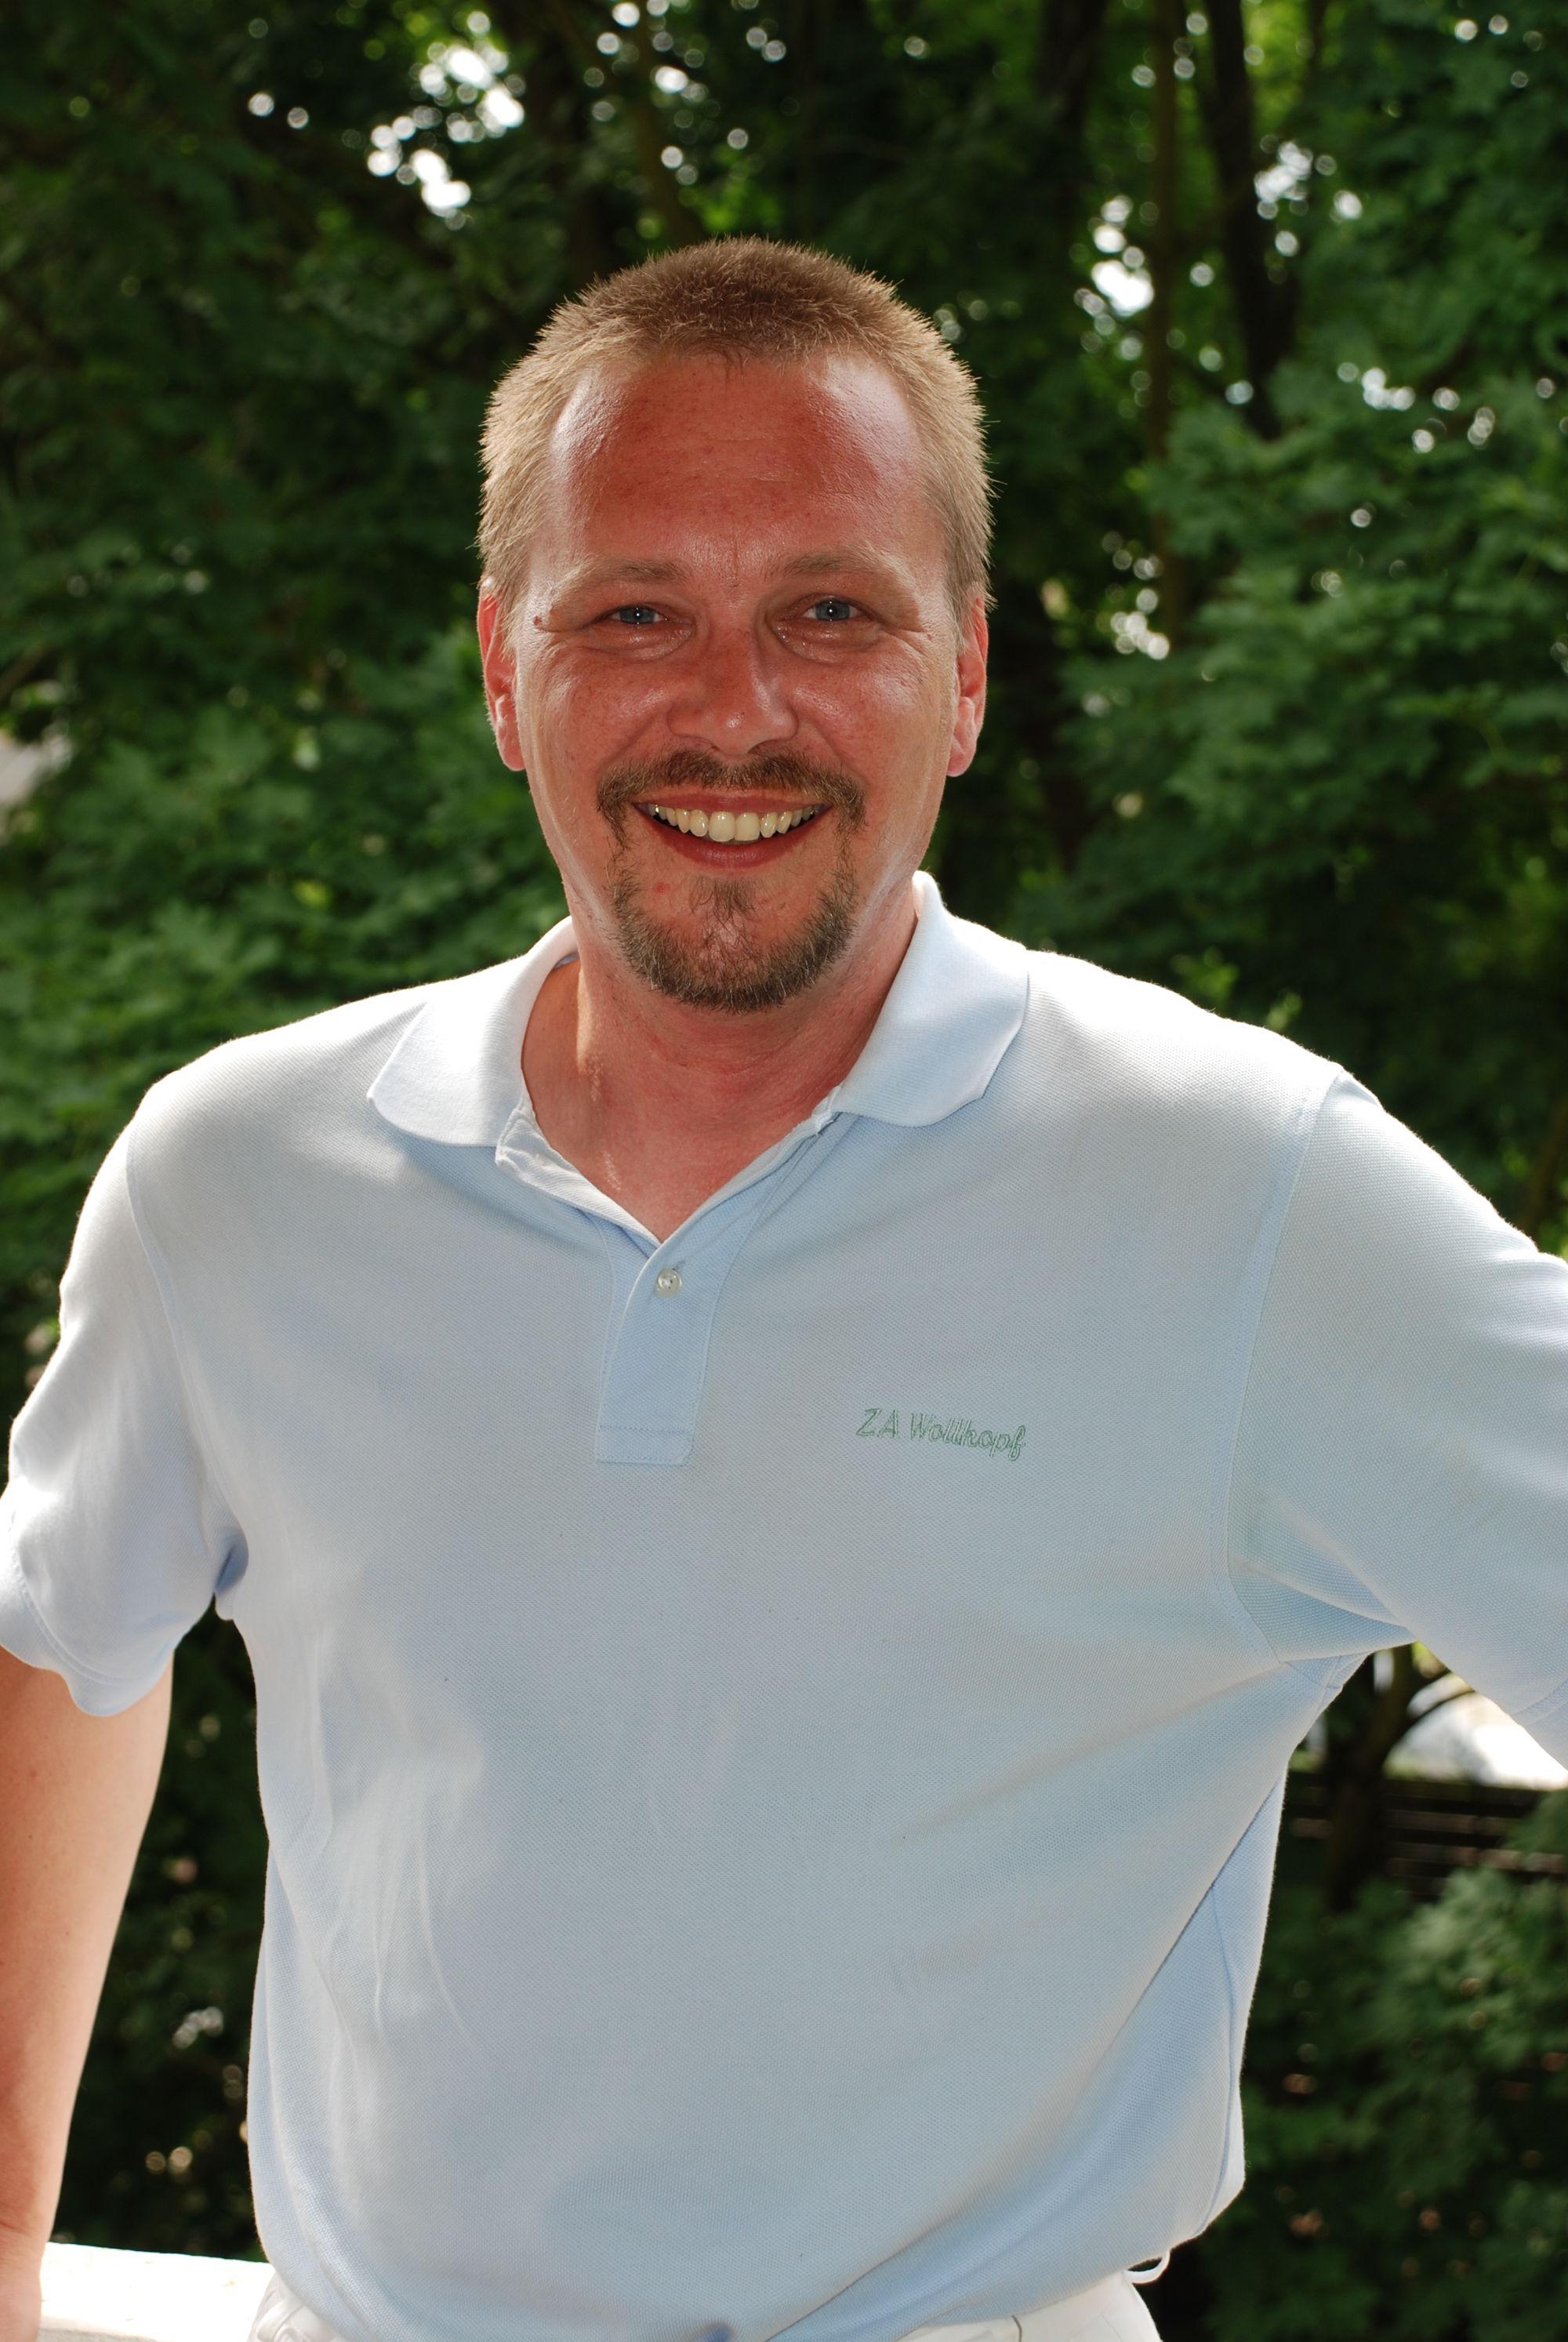 Guido Wollkopf